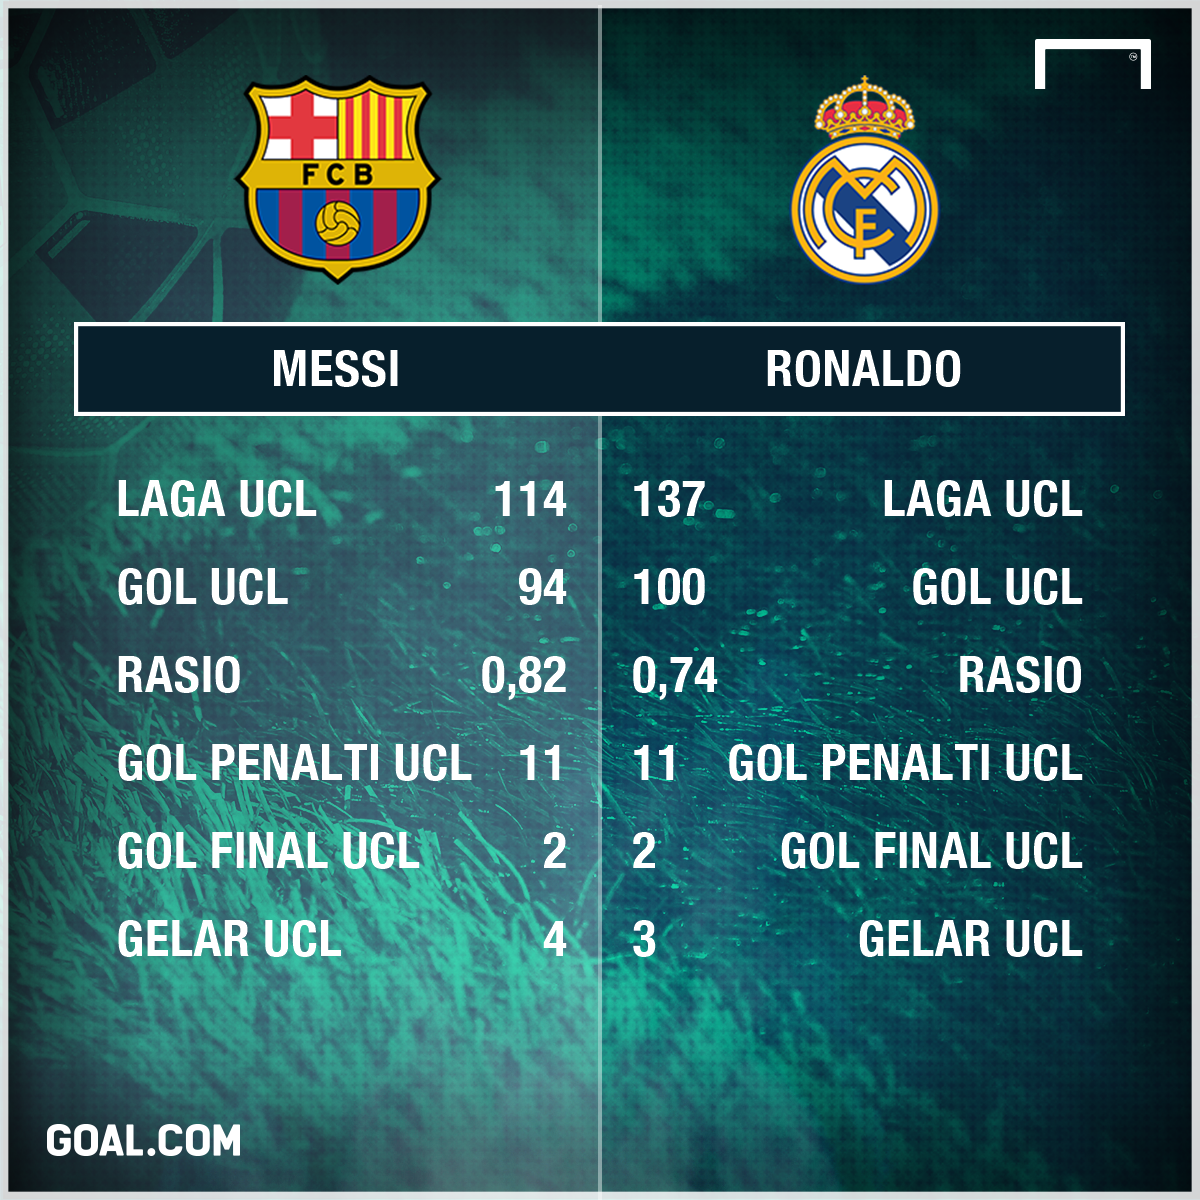 Statistik Gol UCL: Messi v Ronaldo